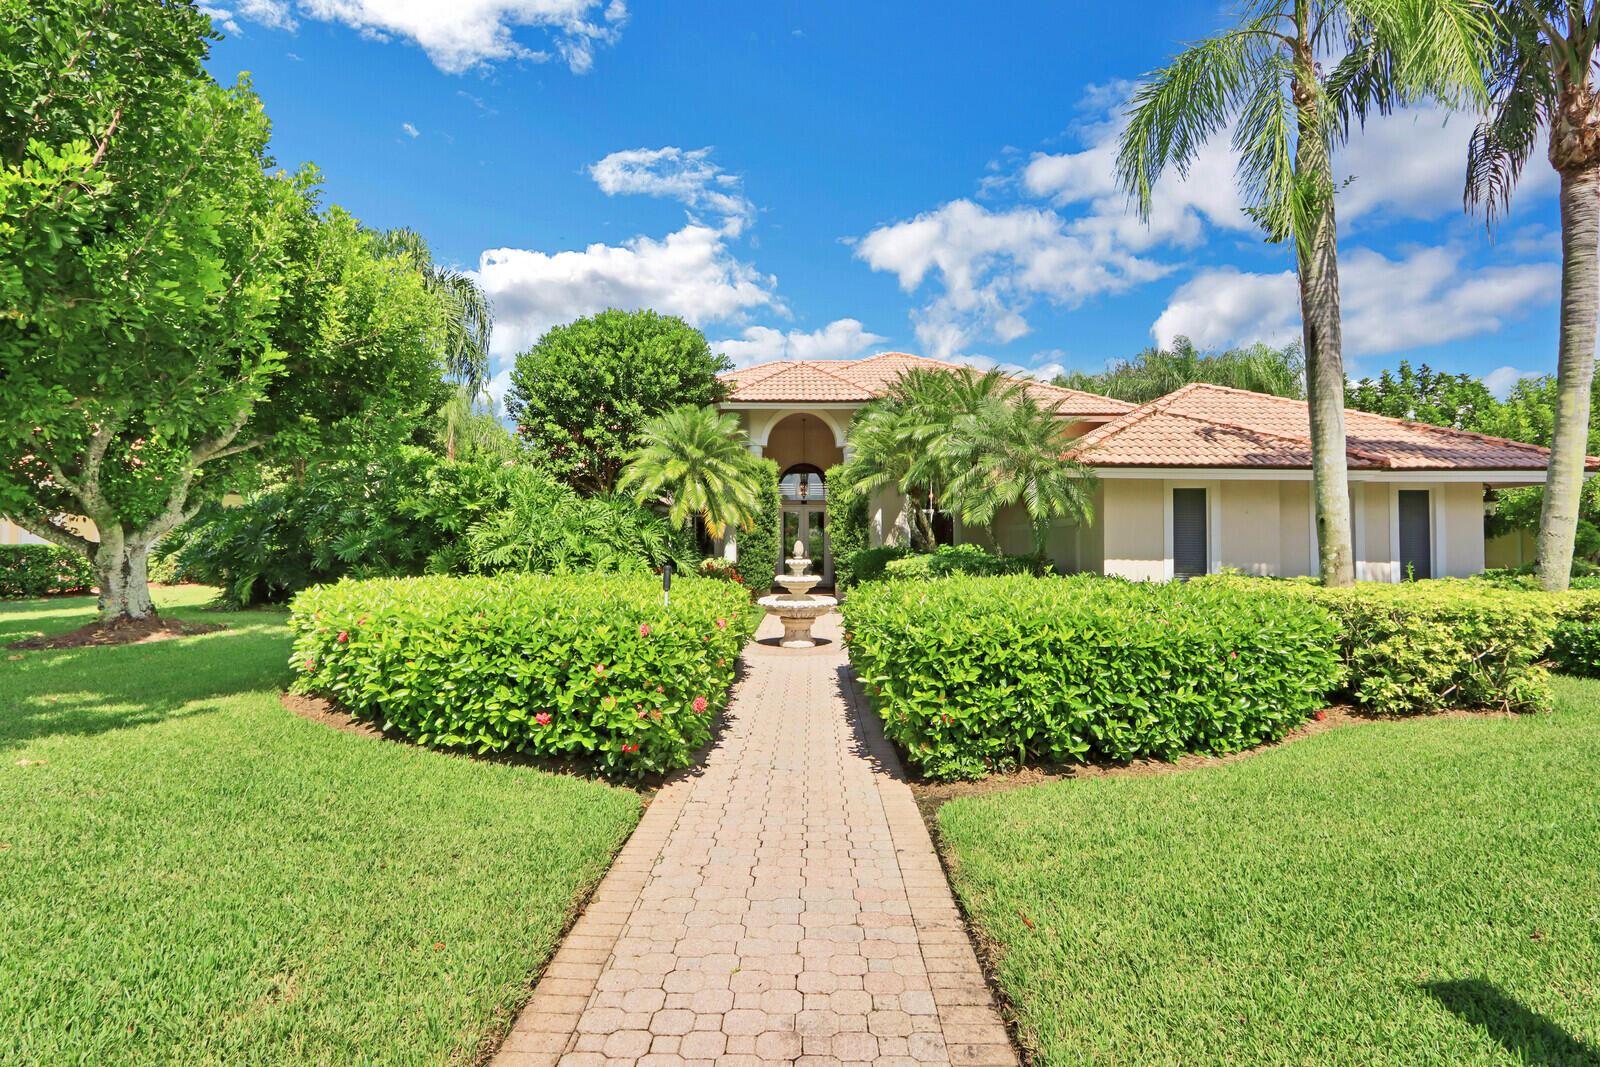 Photo of 107 Thornton Drive, Palm Beach Gardens, FL 33418 (MLS # RX-10749777)